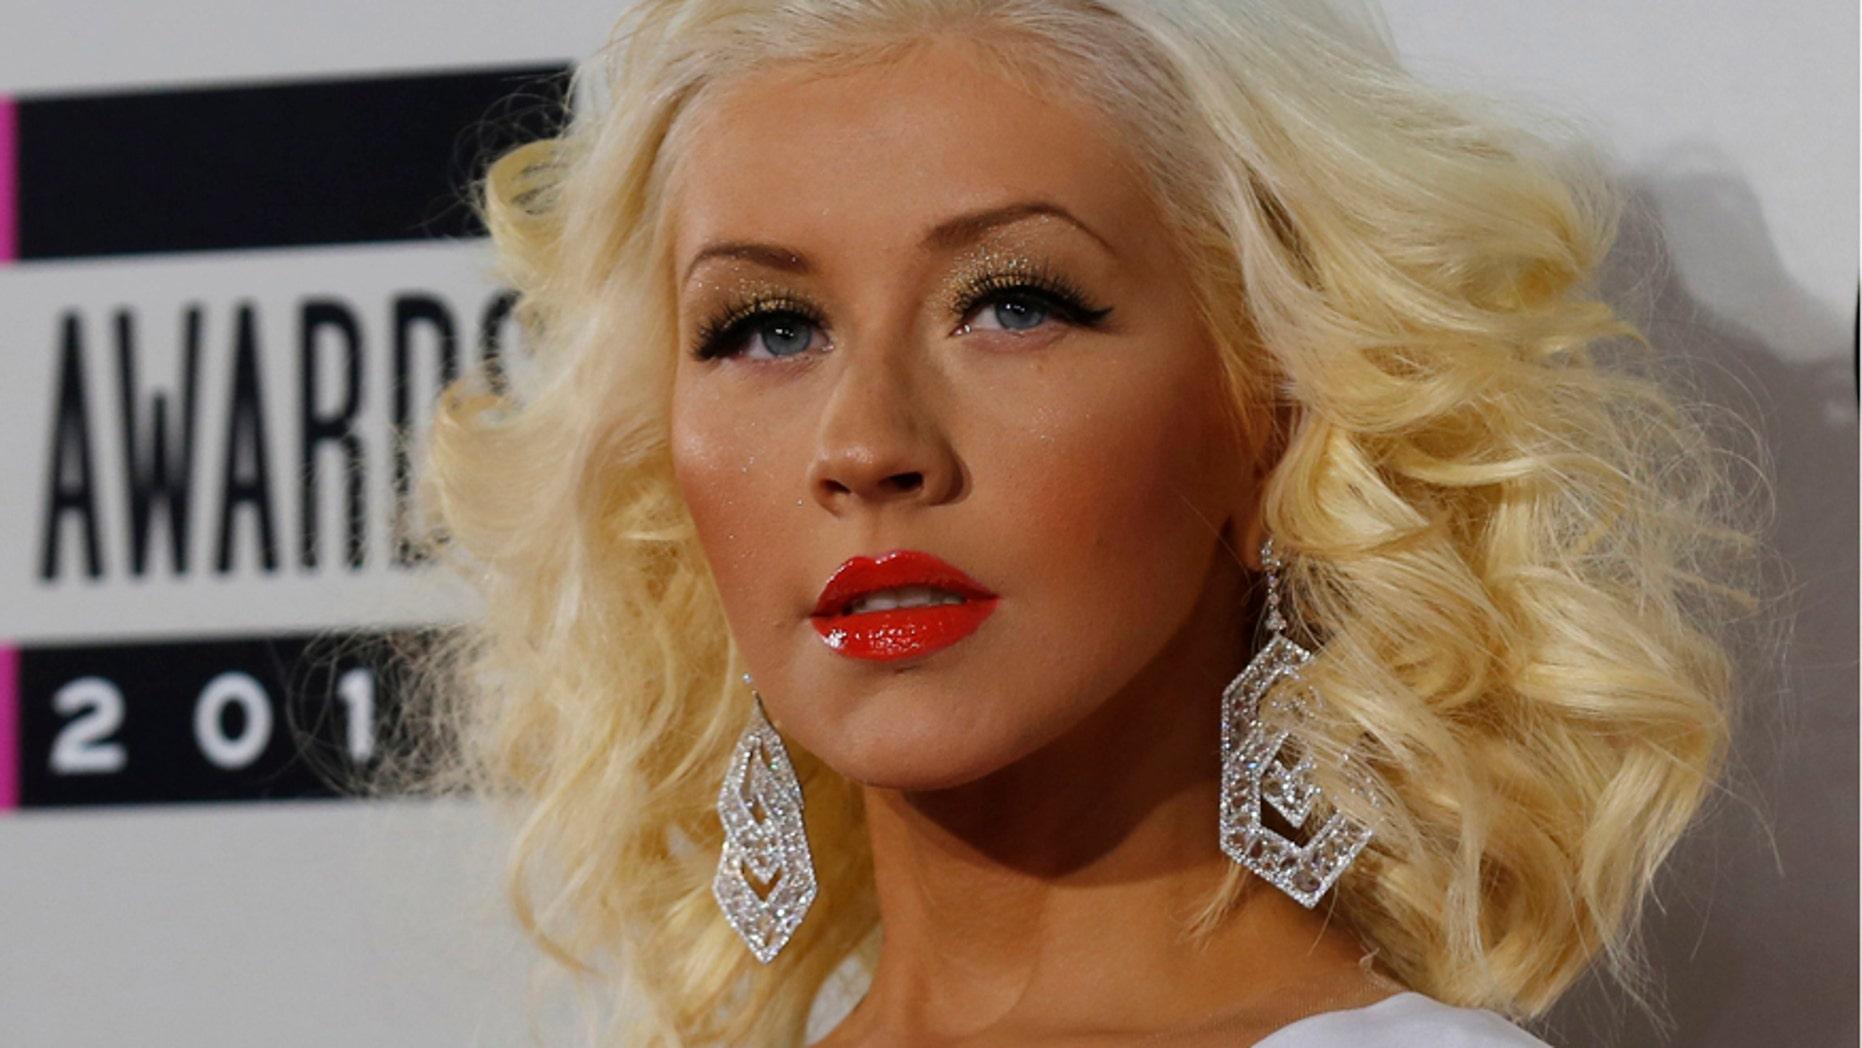 Musician Christina Aguilera arrives at the 41st American Music Awards in Los Angeles, California November 24, 2013.